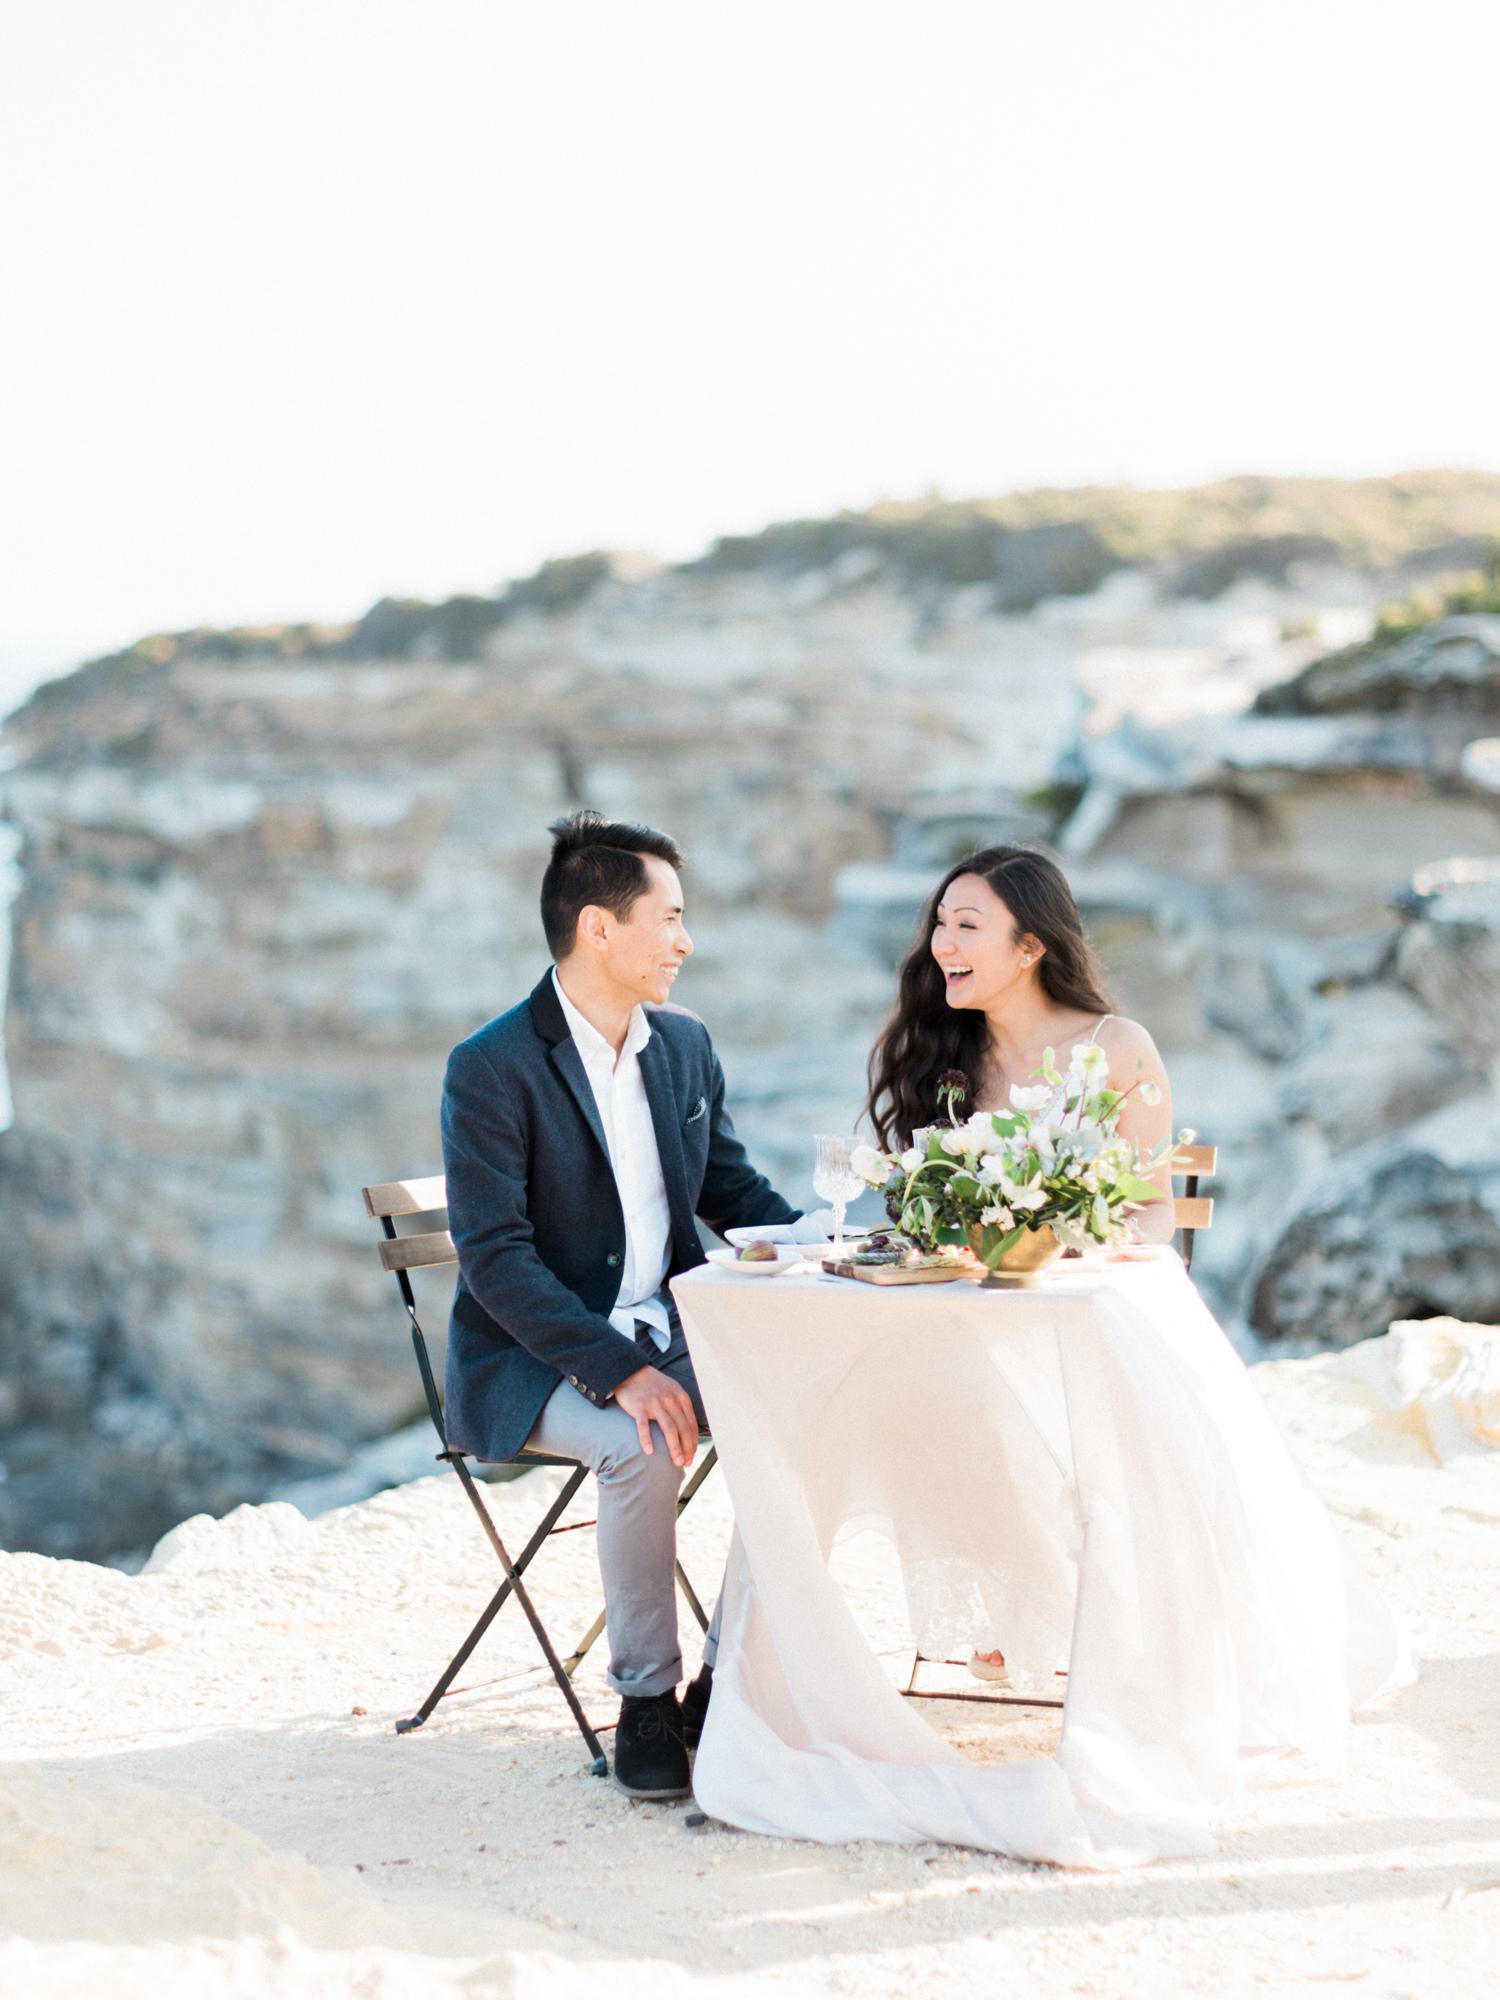 waop-marissa&sunny-engagement-0089.jpg